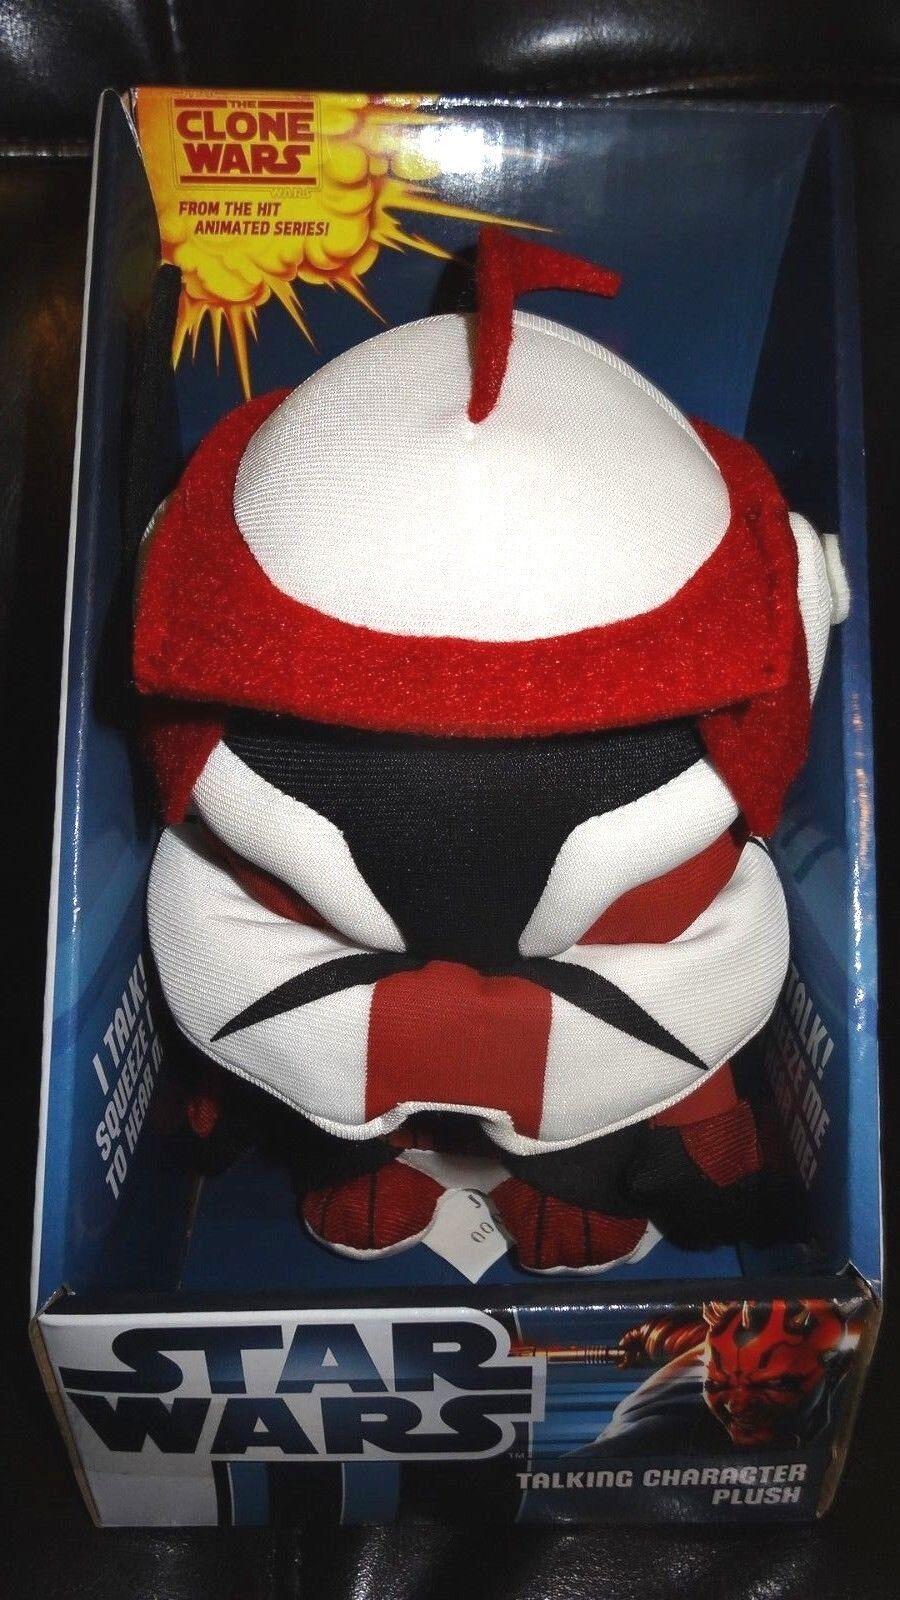 Stern Wars Talking Character Plush Commander Fox,klonen wars animated serie 2012